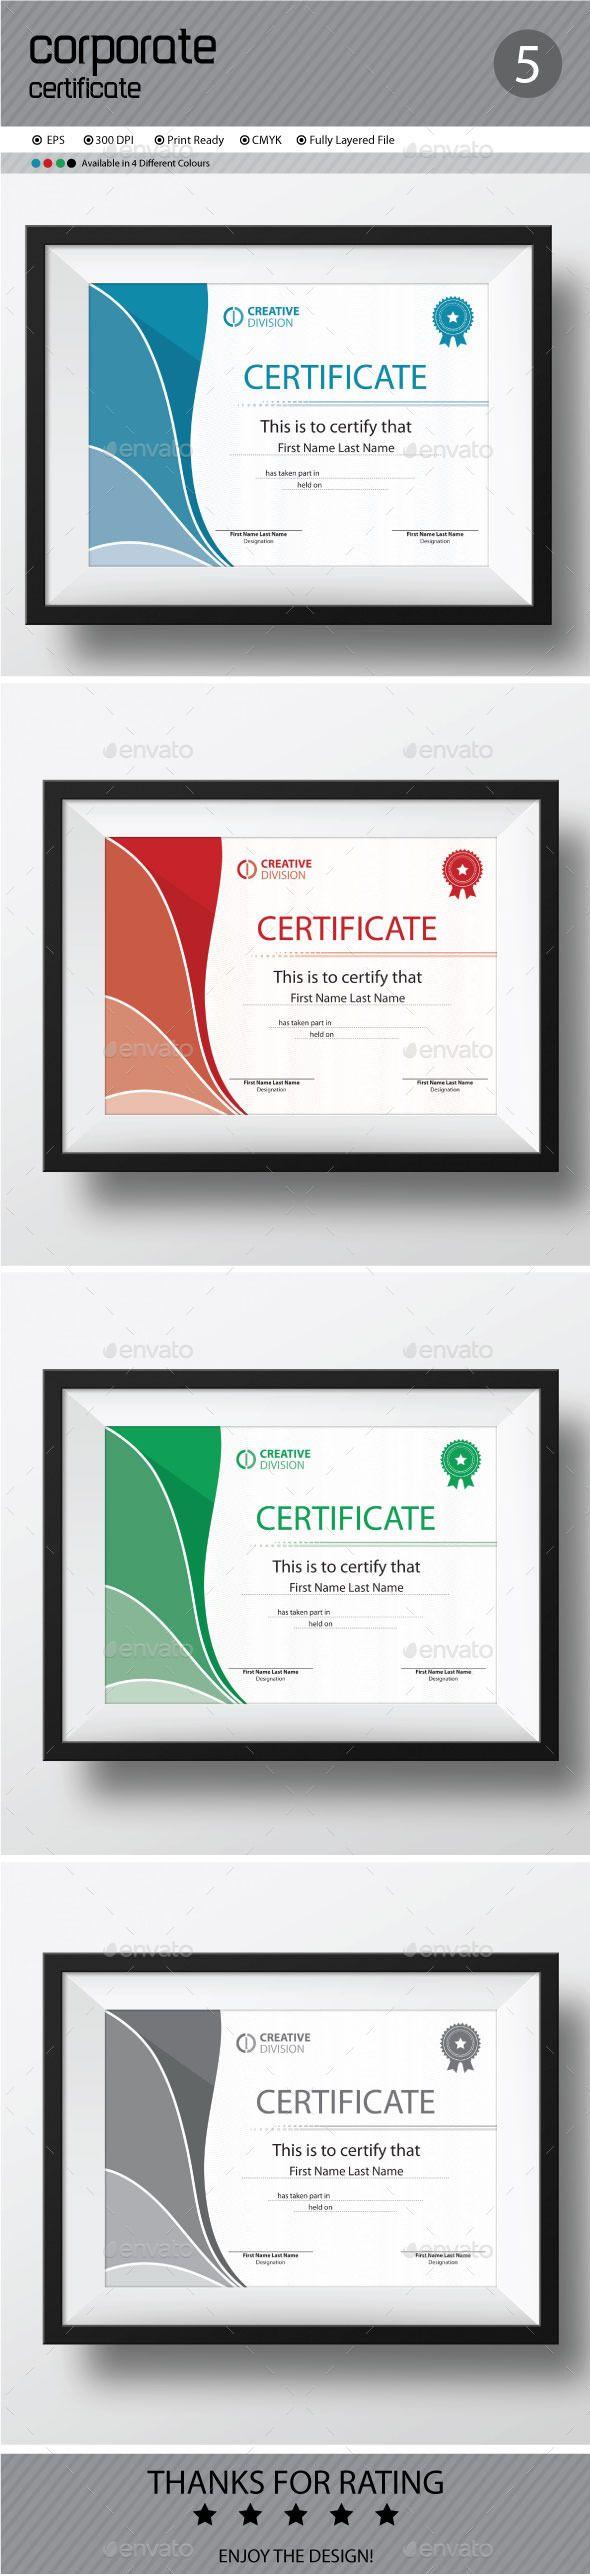 Certificate Template Vector EPS. Download here: http://graphicriver.net/item/certificate/11642855?ref=ksioks